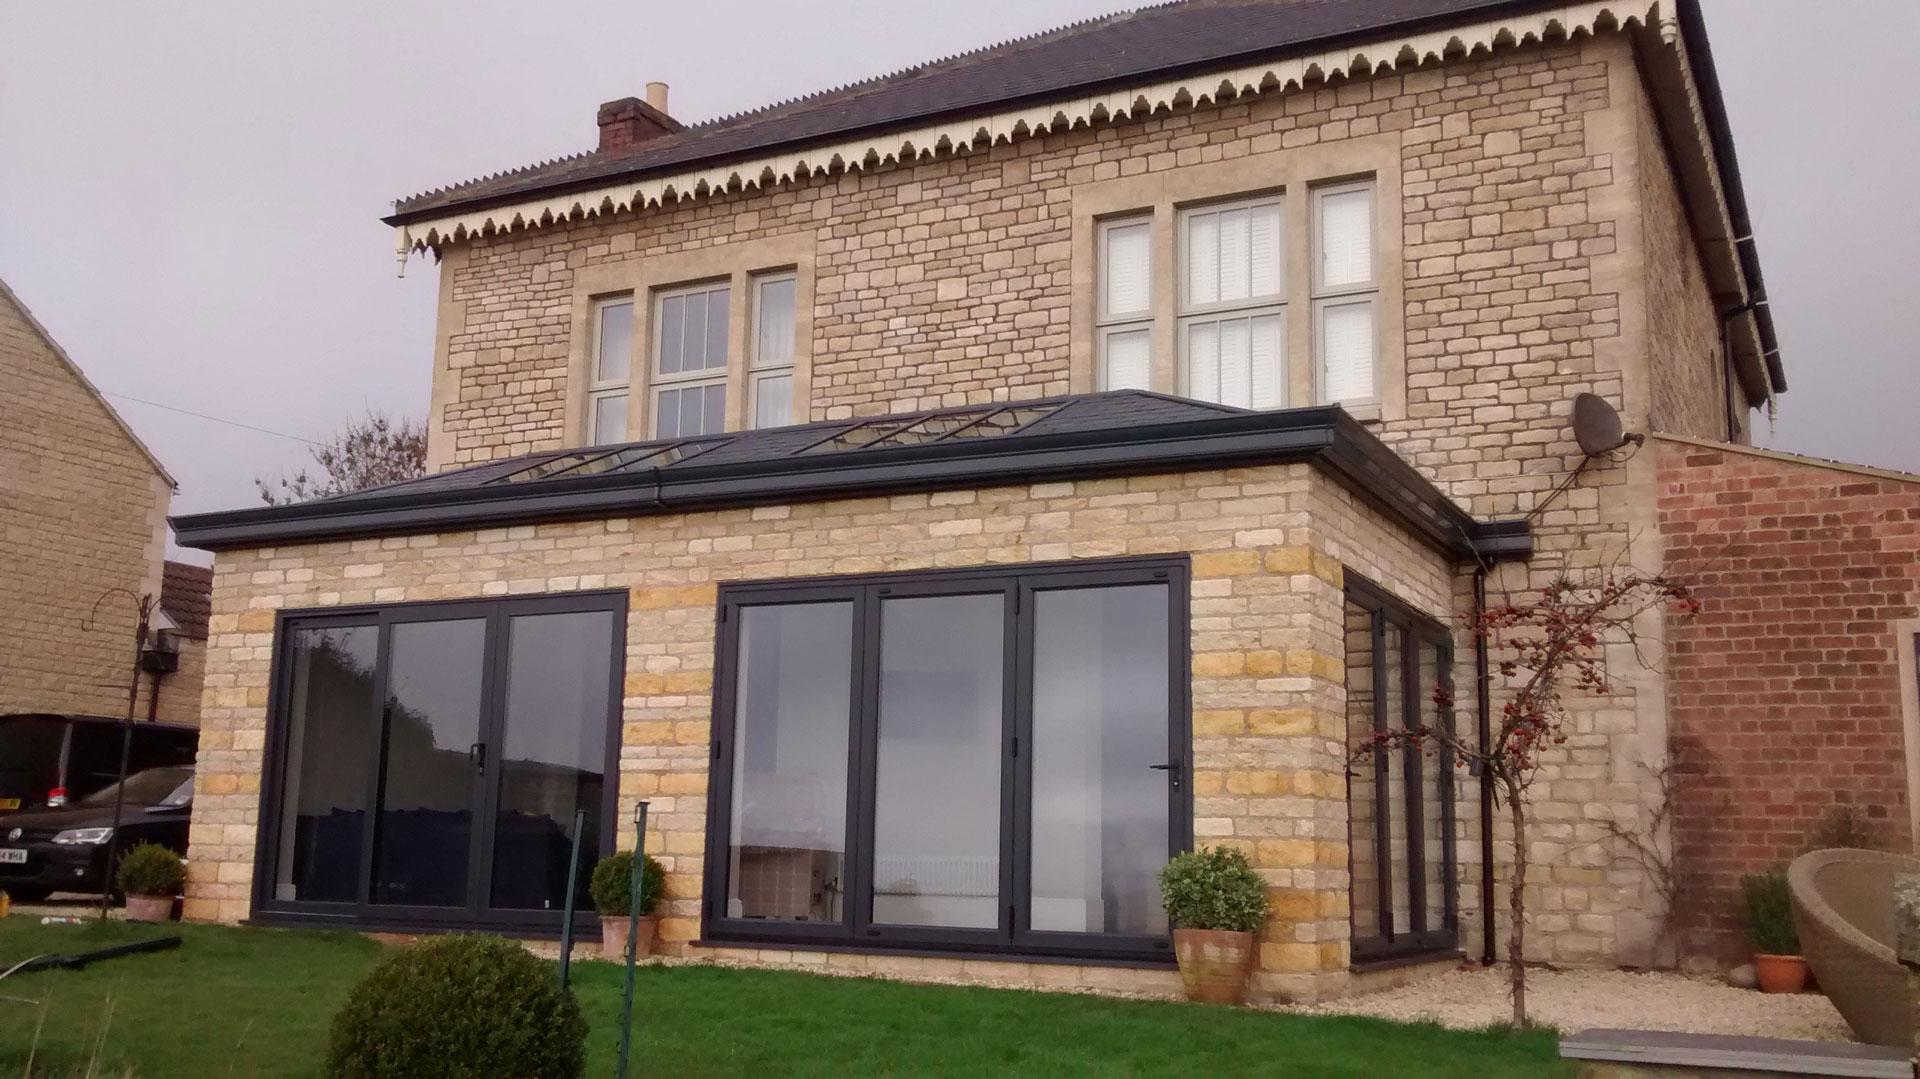 Double Glazing in Leamington Spa